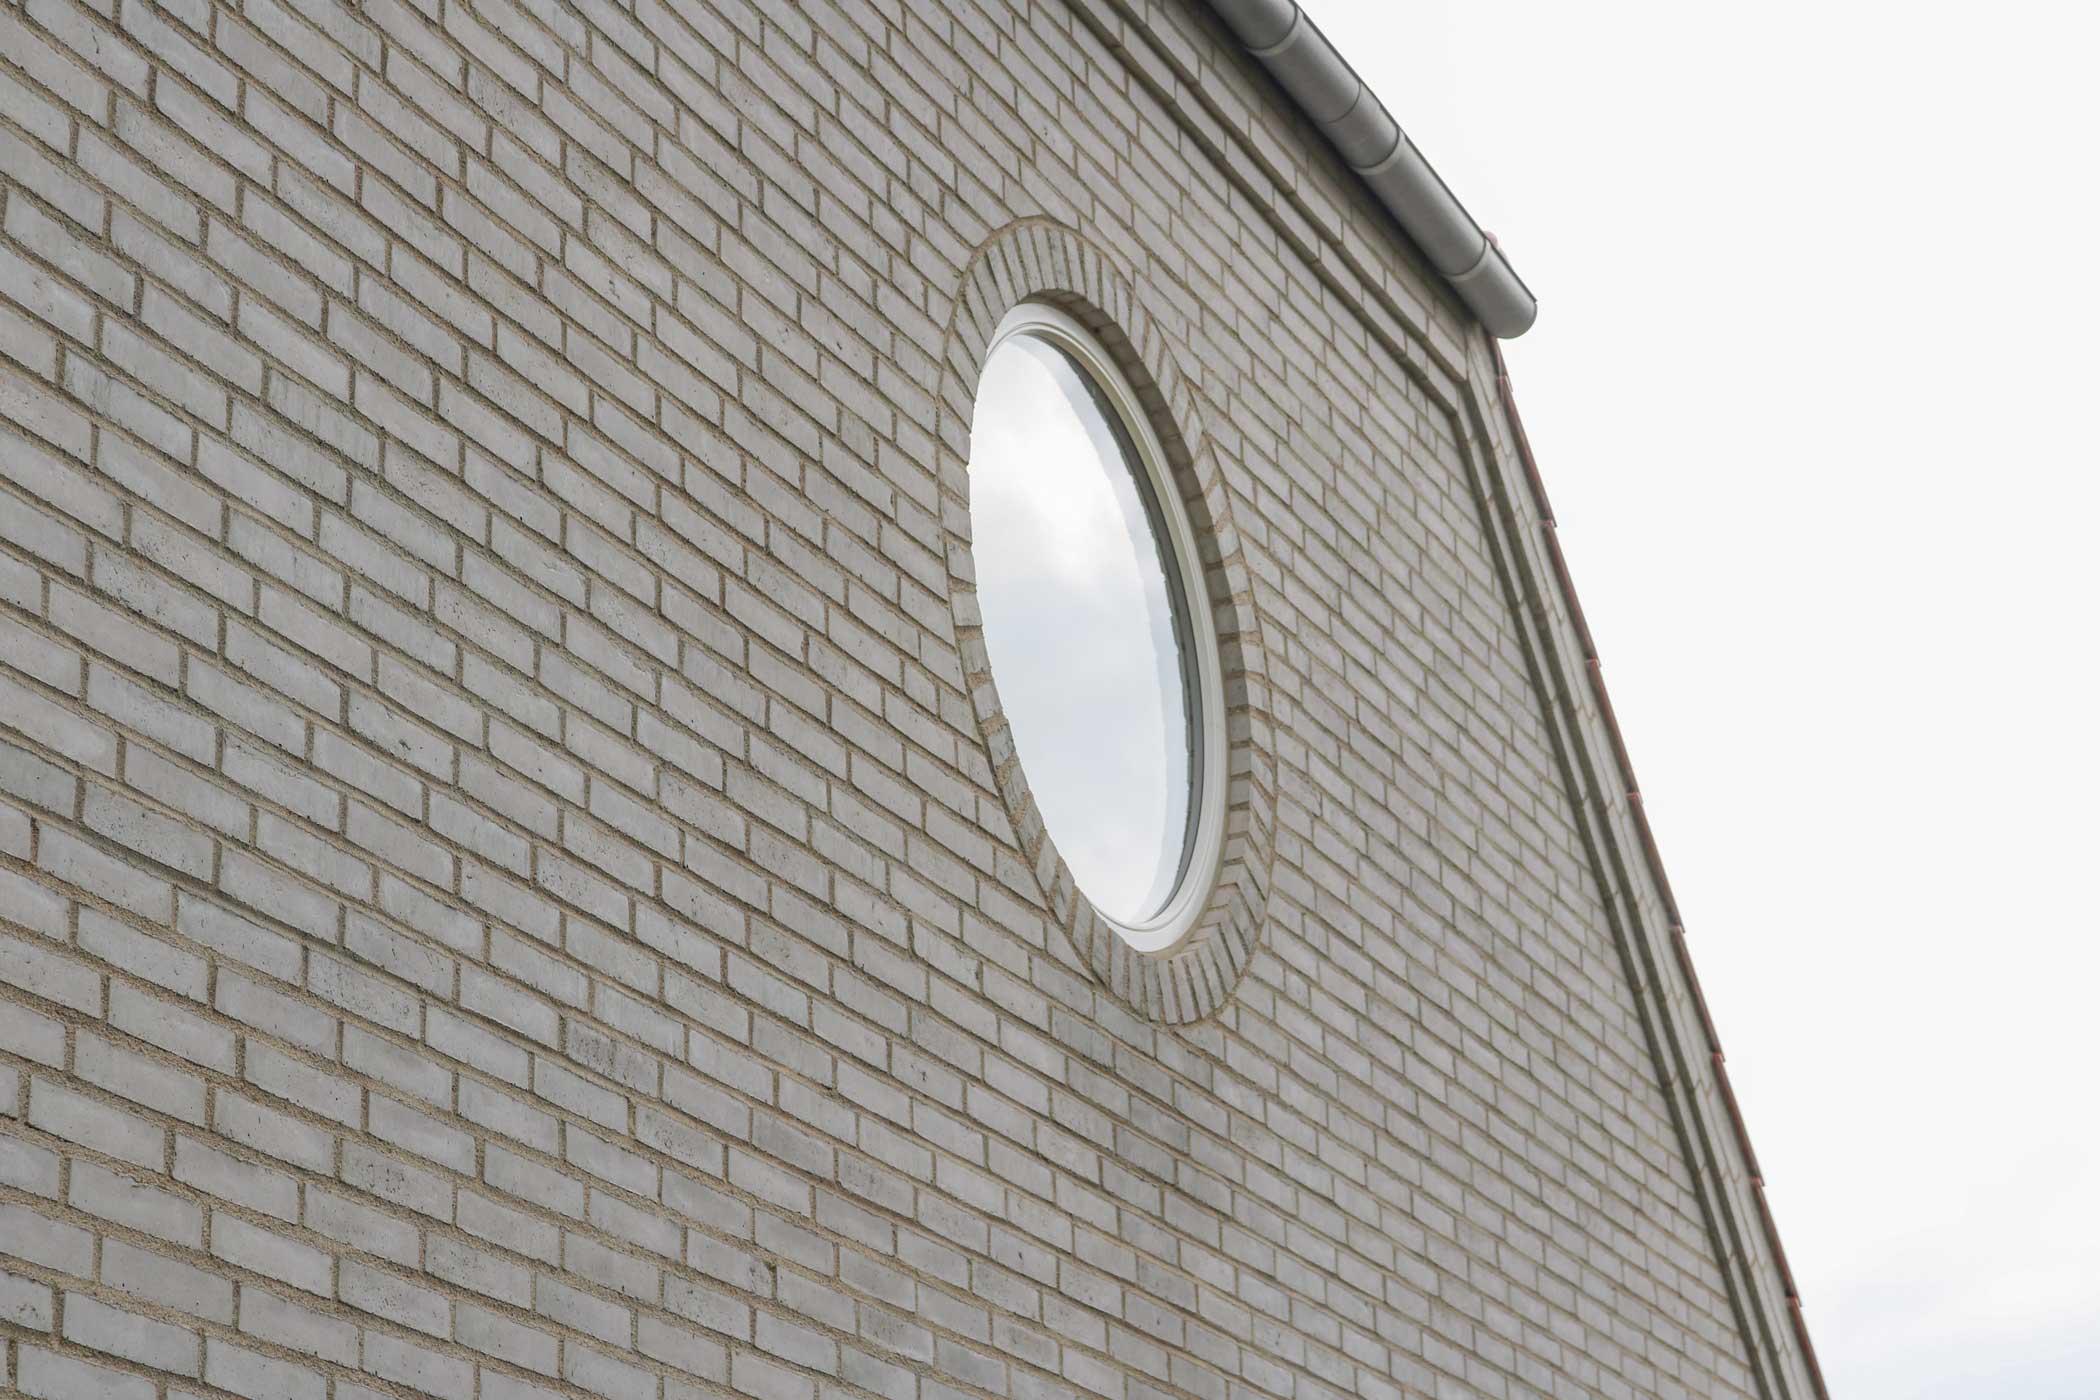 Rundt vindue i gavl